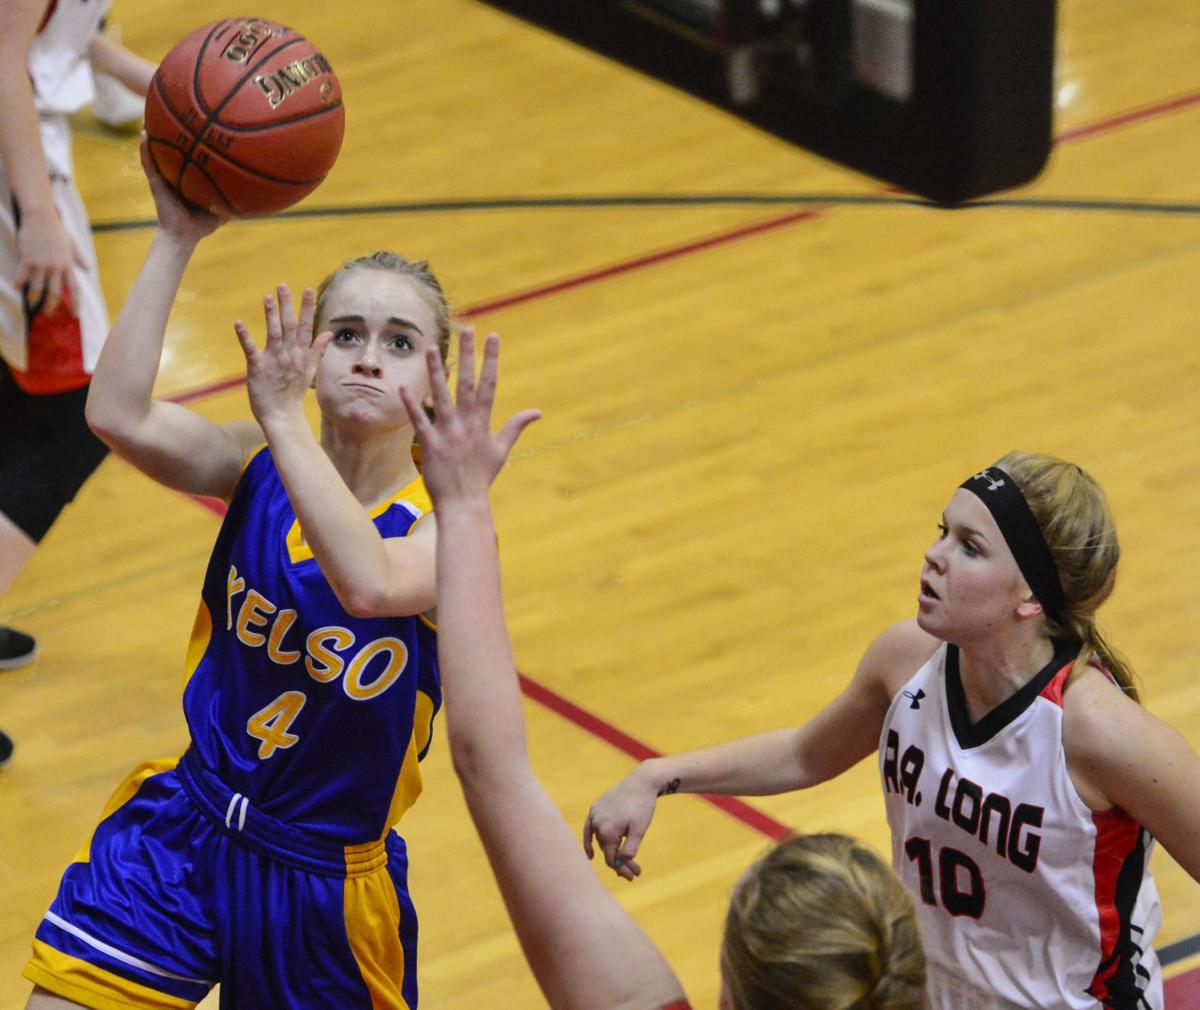 Kelso girls' basketball